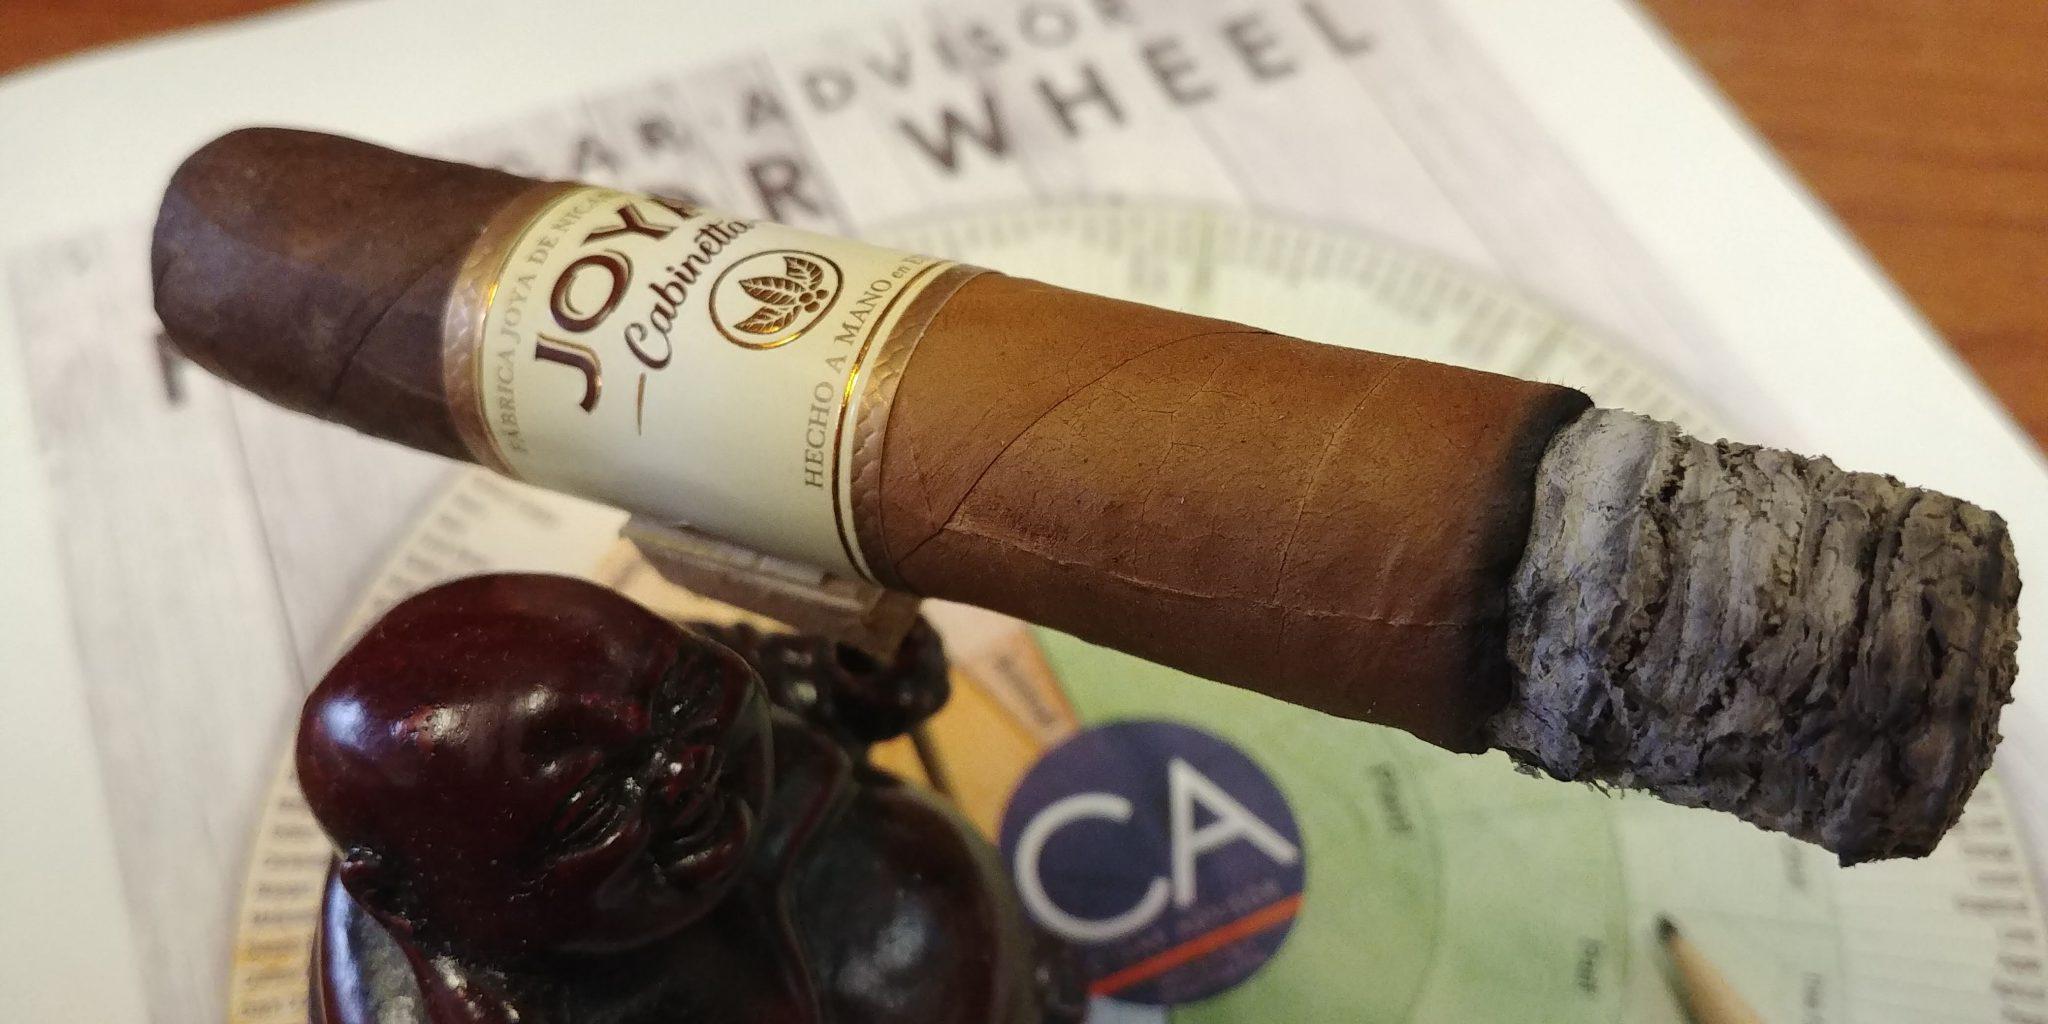 Joya de Nicaragua cigars guide joya de nicaragua jdn Joya Cabinetta cigar review by John Pullo